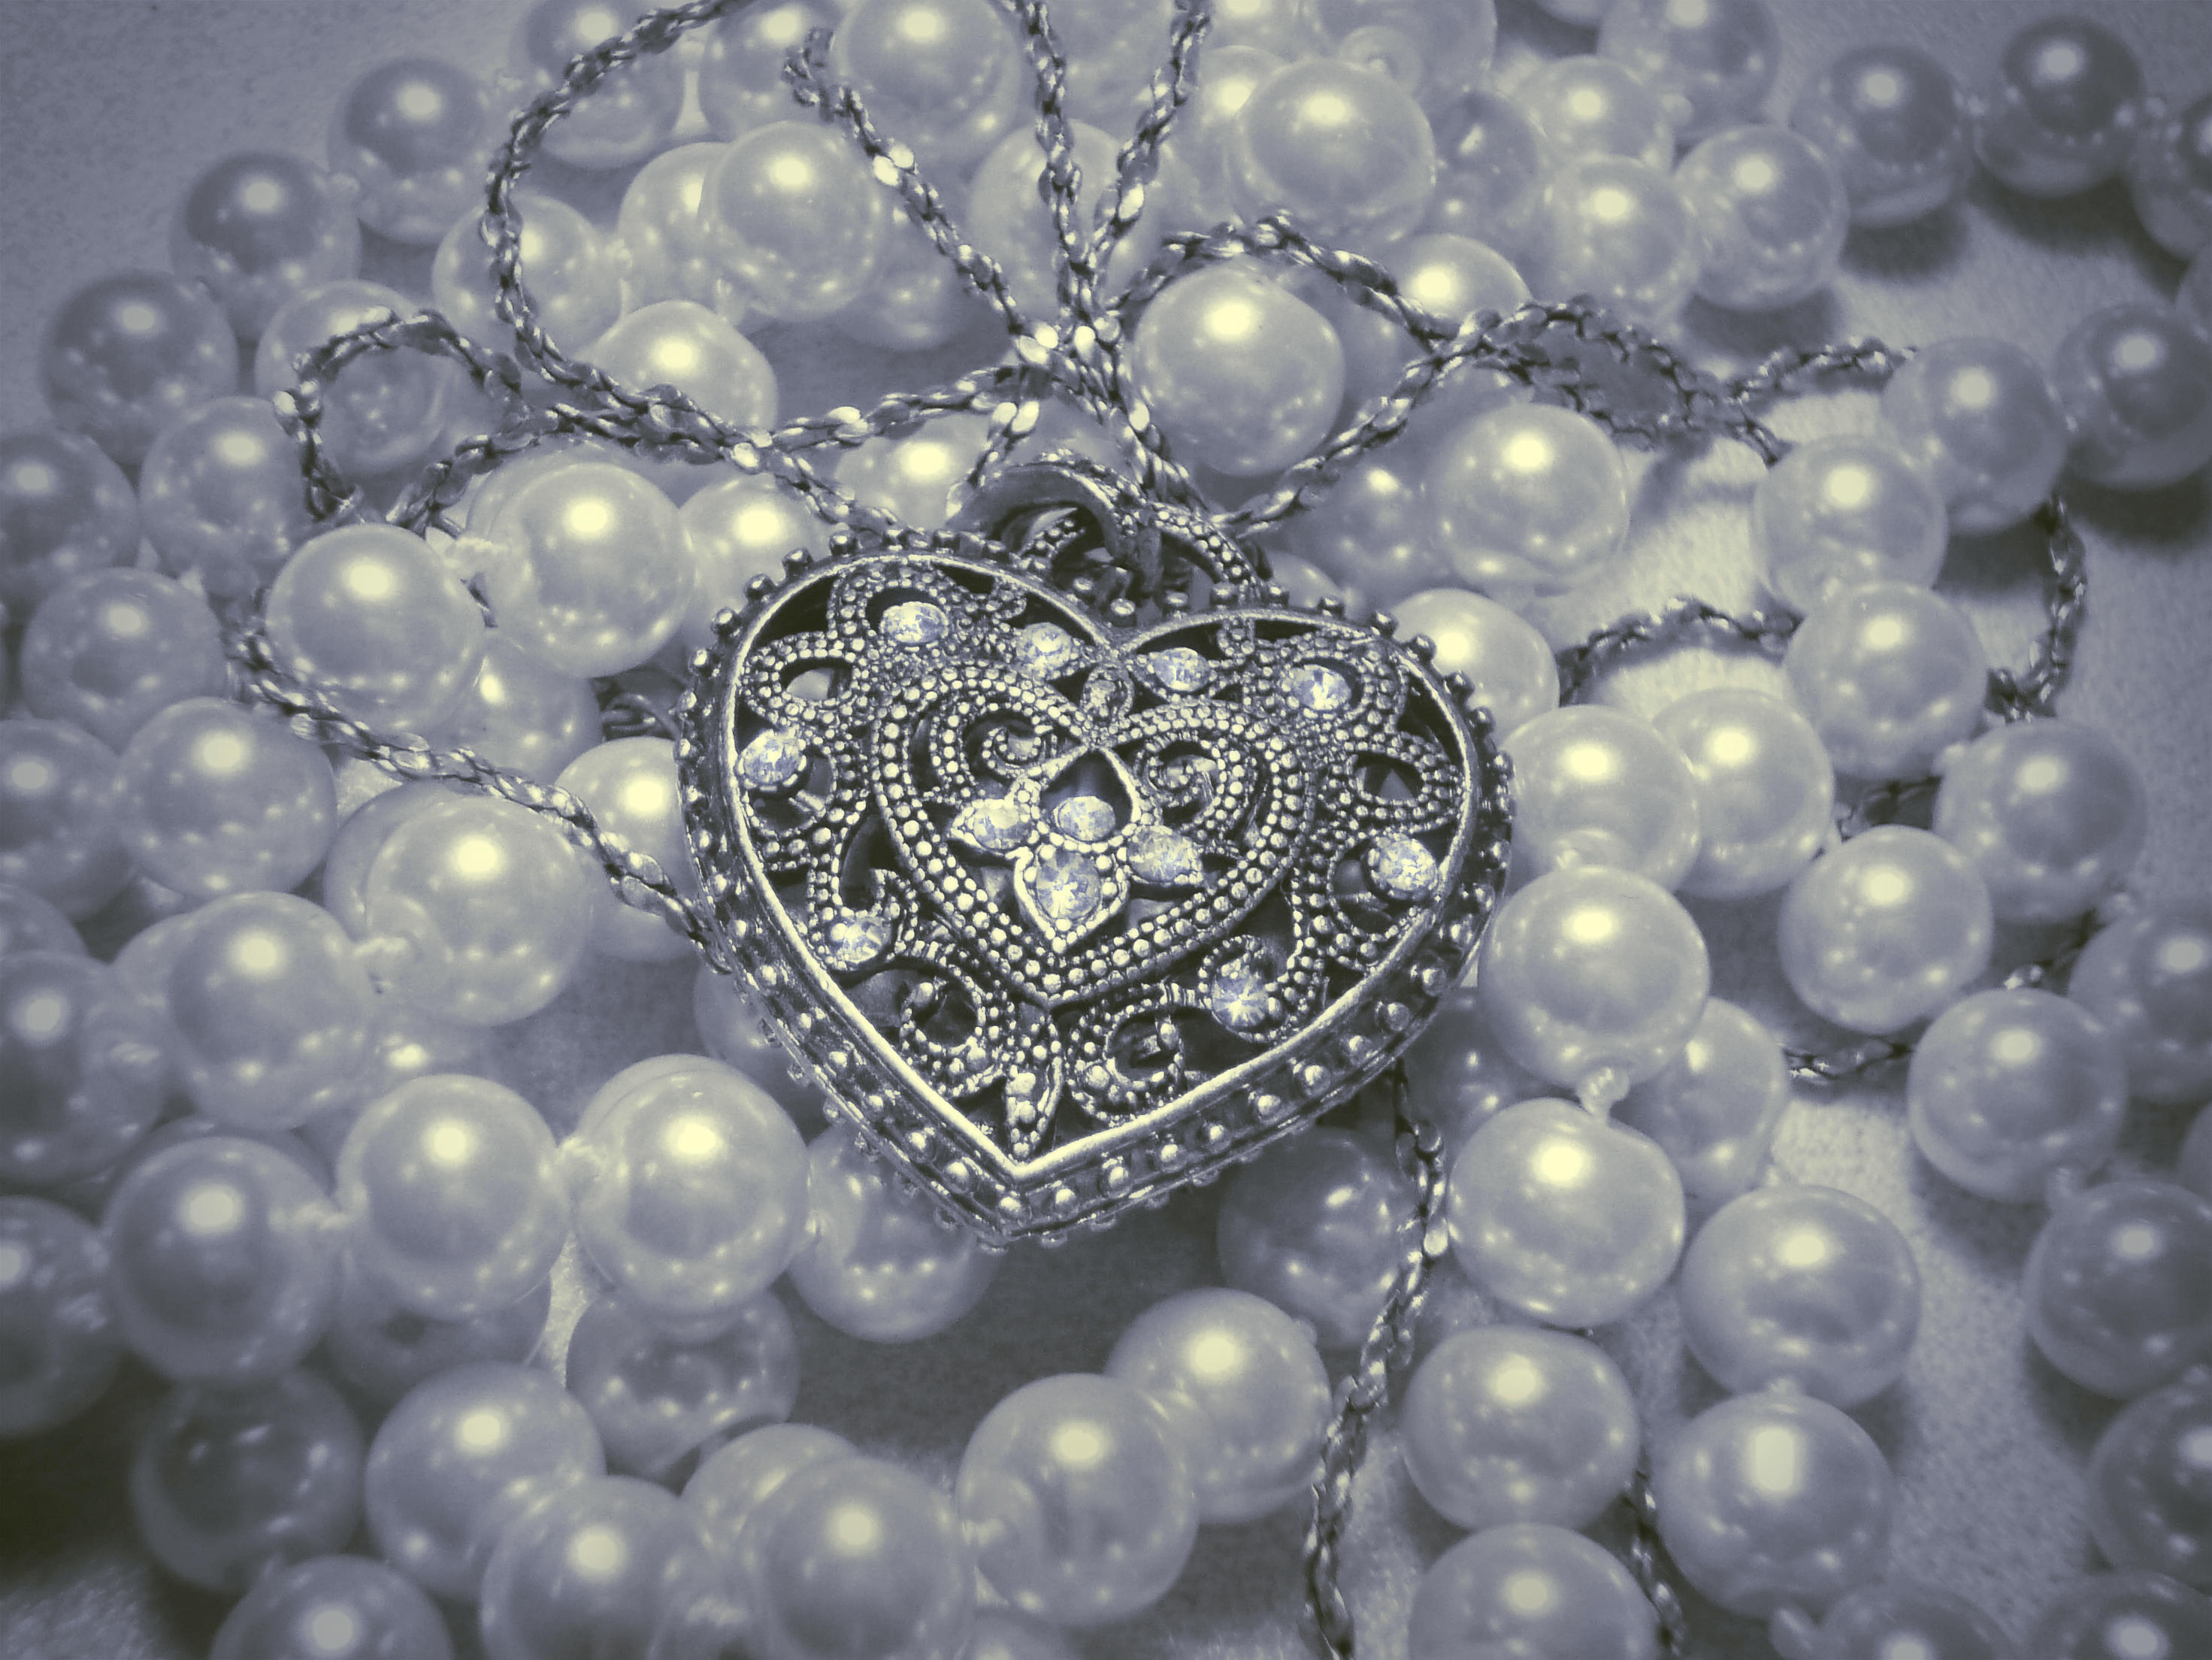 обои украшение, бусы, жемчуг, сердечко картинки фото